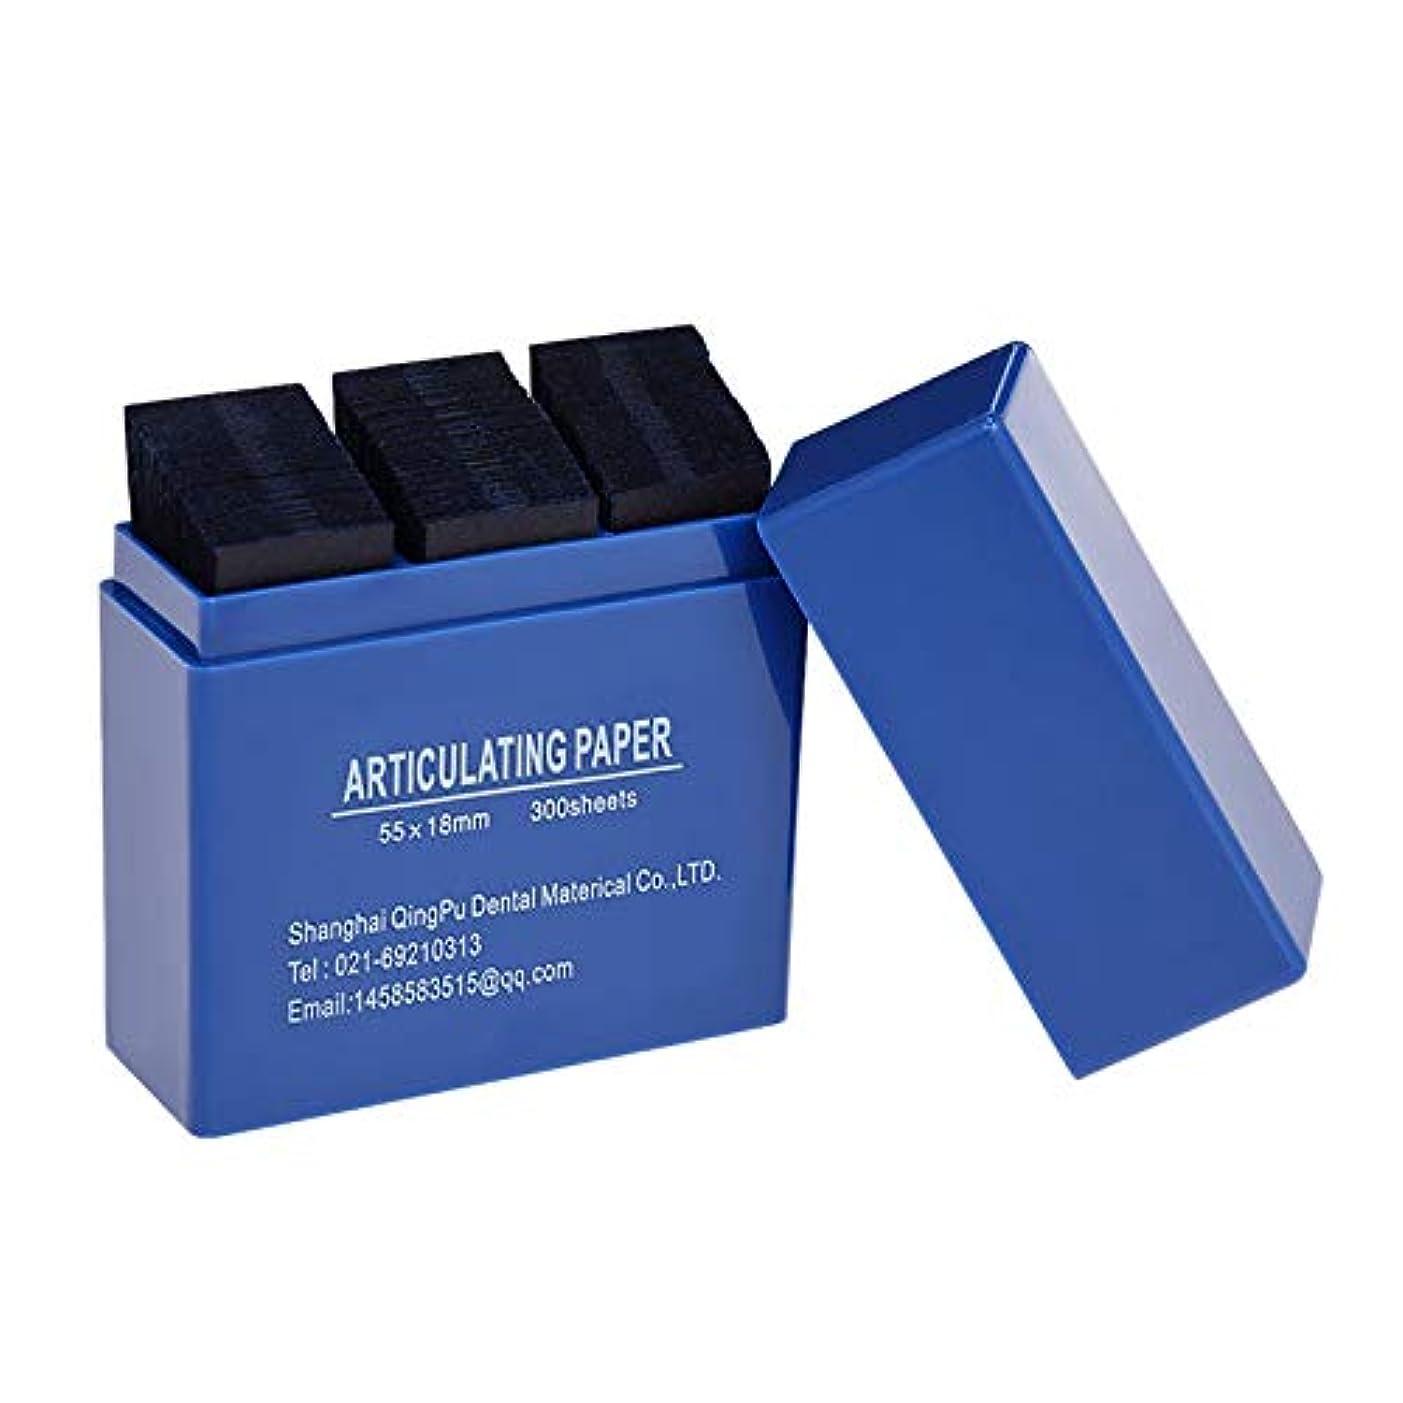 RaiFu 歯科 関節式 ペーパーストリップ 歯科用 ラボ用 製品ツール 口腔用歯のケア用品 300シート/ボックス ブルー